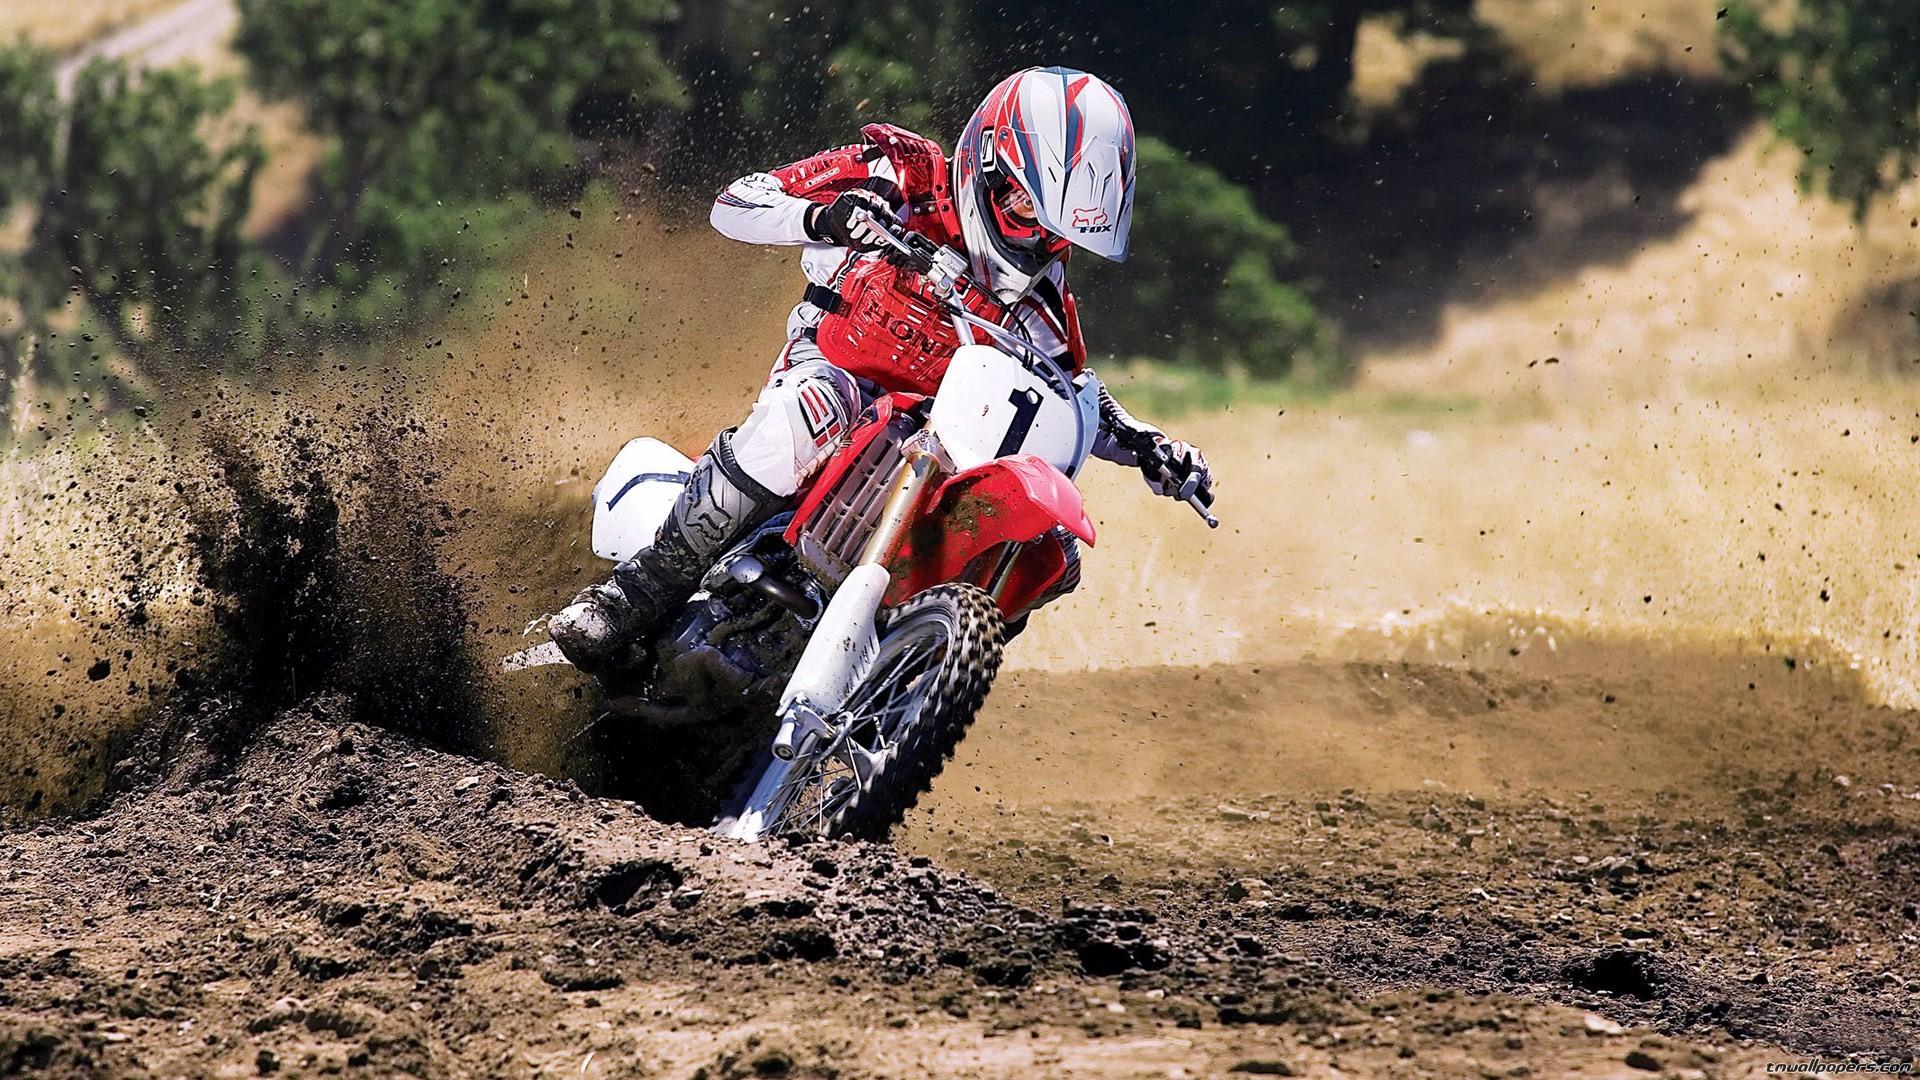 Motocross Screensavers Wallpapers 76 images